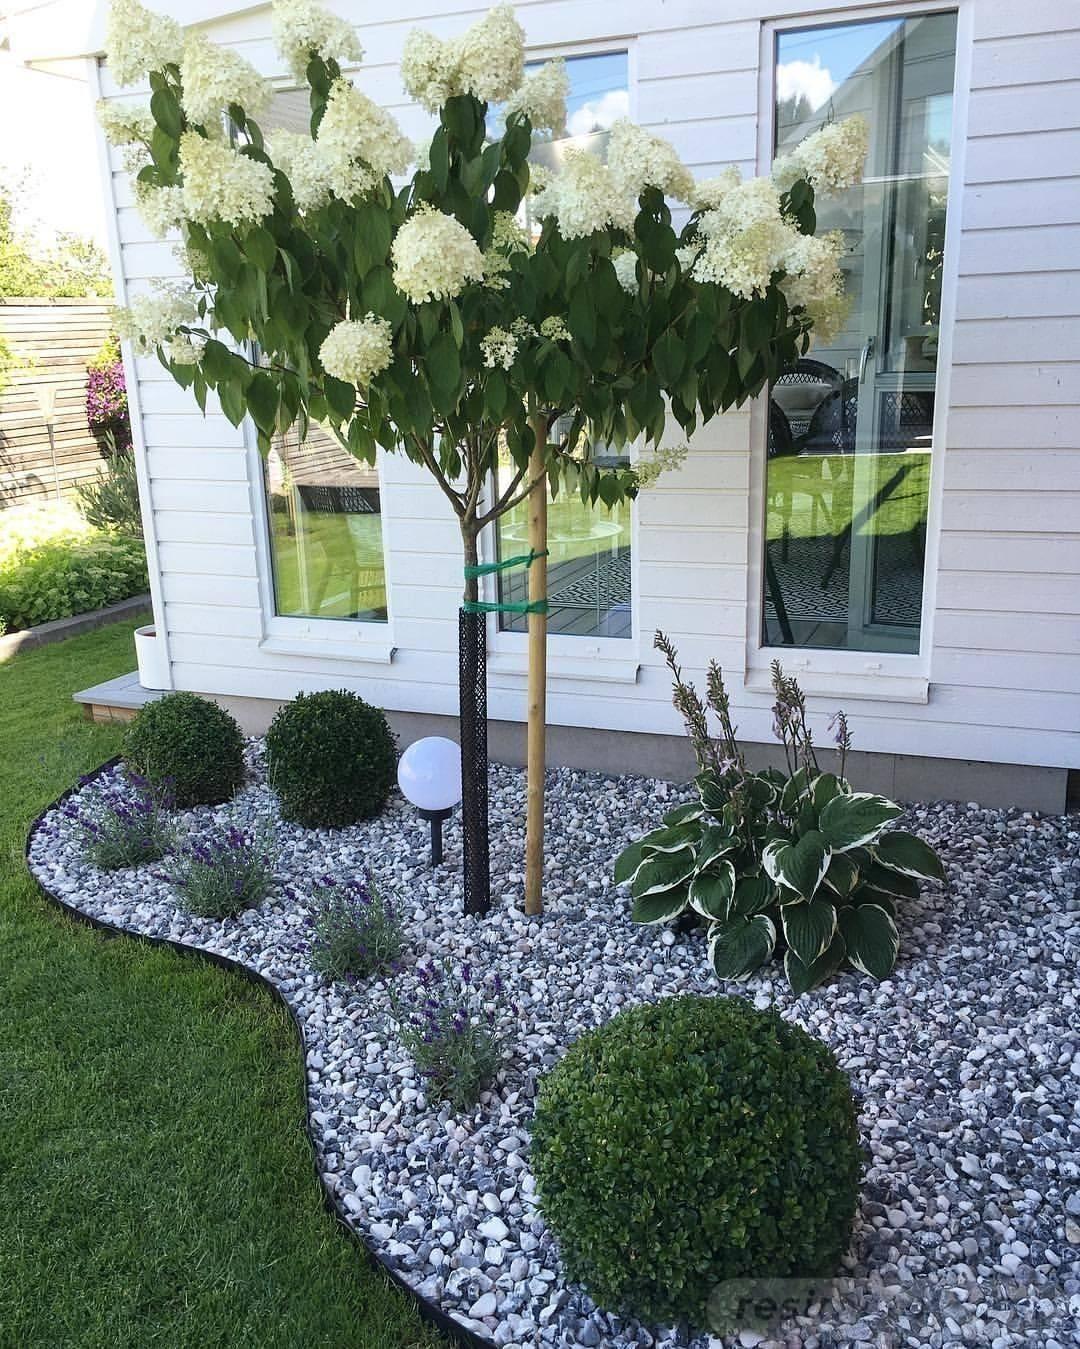 diy garden easy-AQiVGvfJZAsHFYy804Pihh3UWeJOoIcG1kKneapNTQVtfSGpK4IWwH4